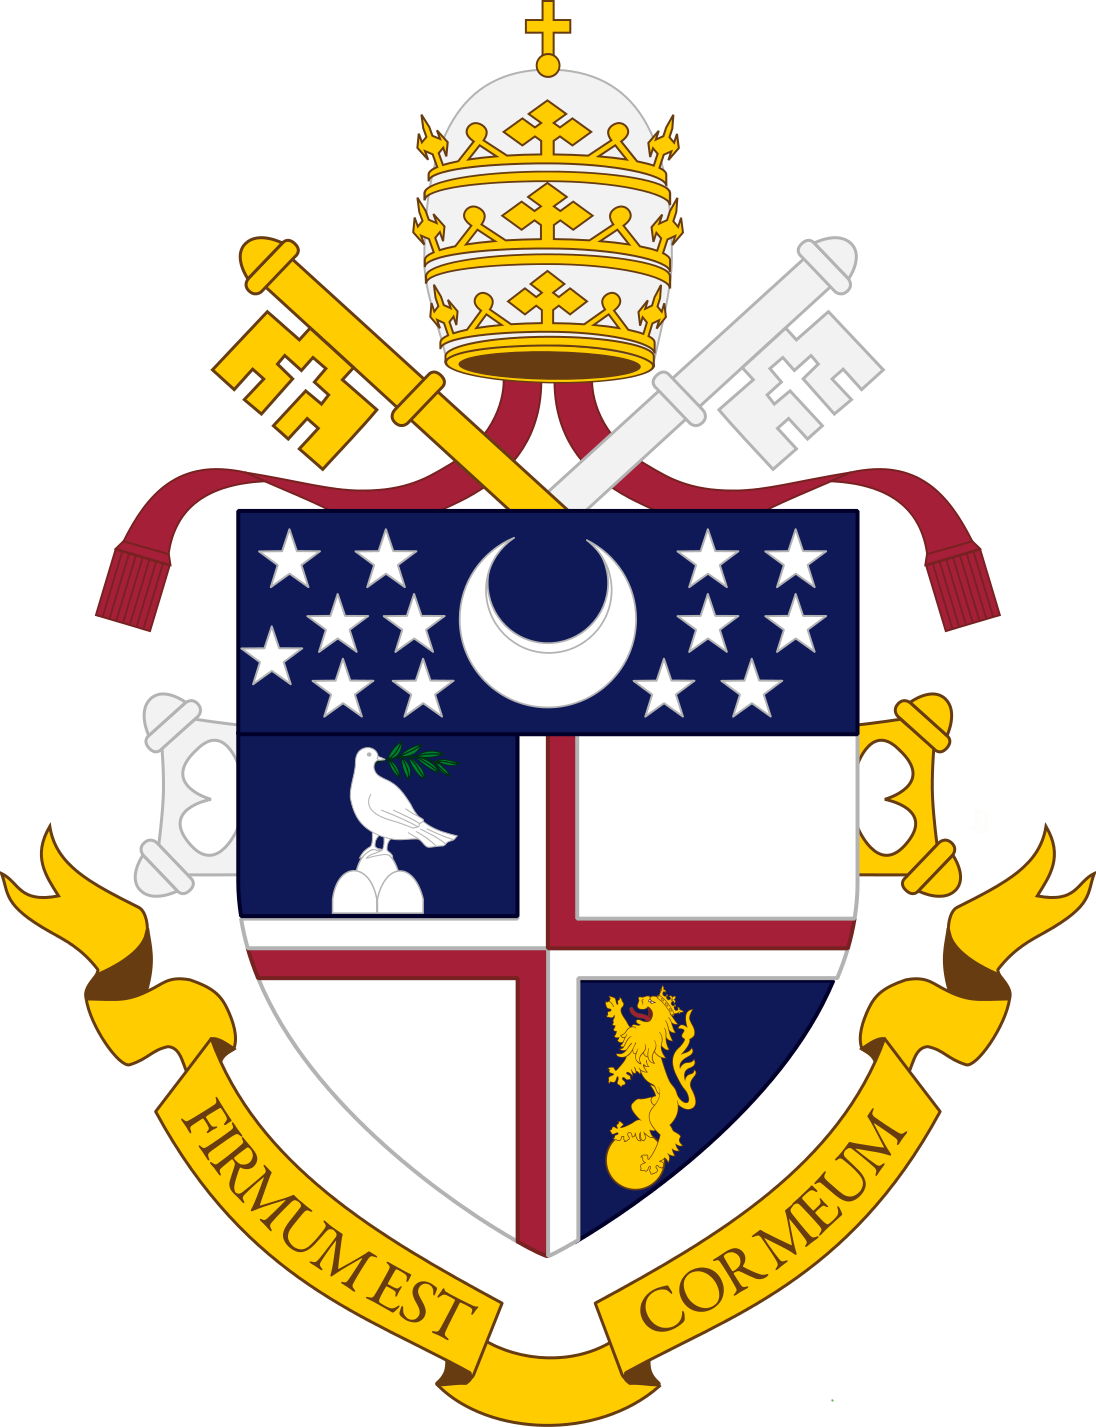 Pontifical University of America